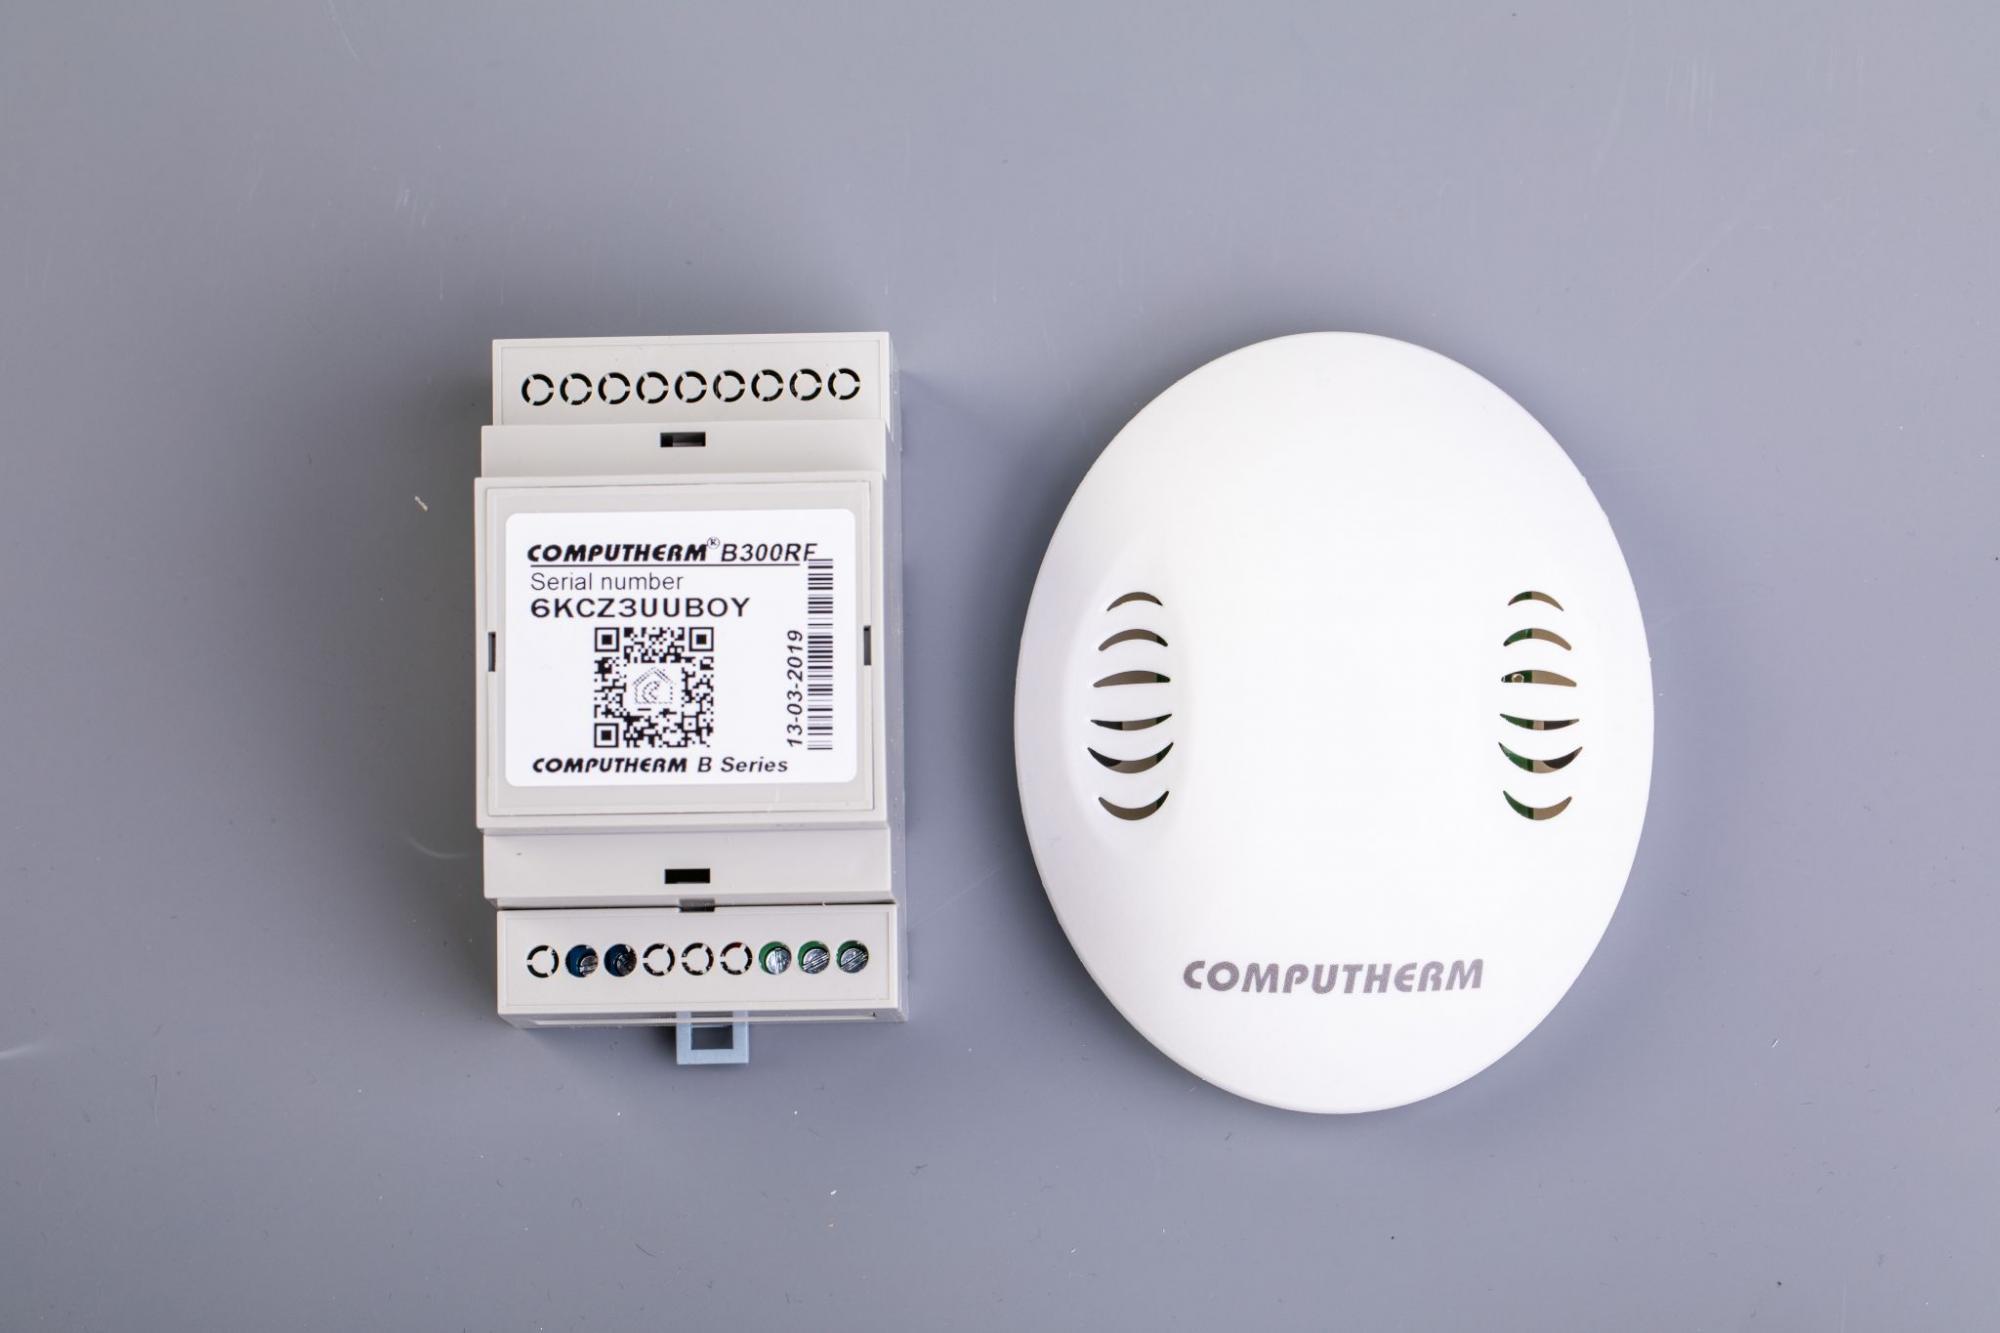 Computherm - Wi-fi termosztátok -  COMPUTHERM B300RF - Quantrax Kft.